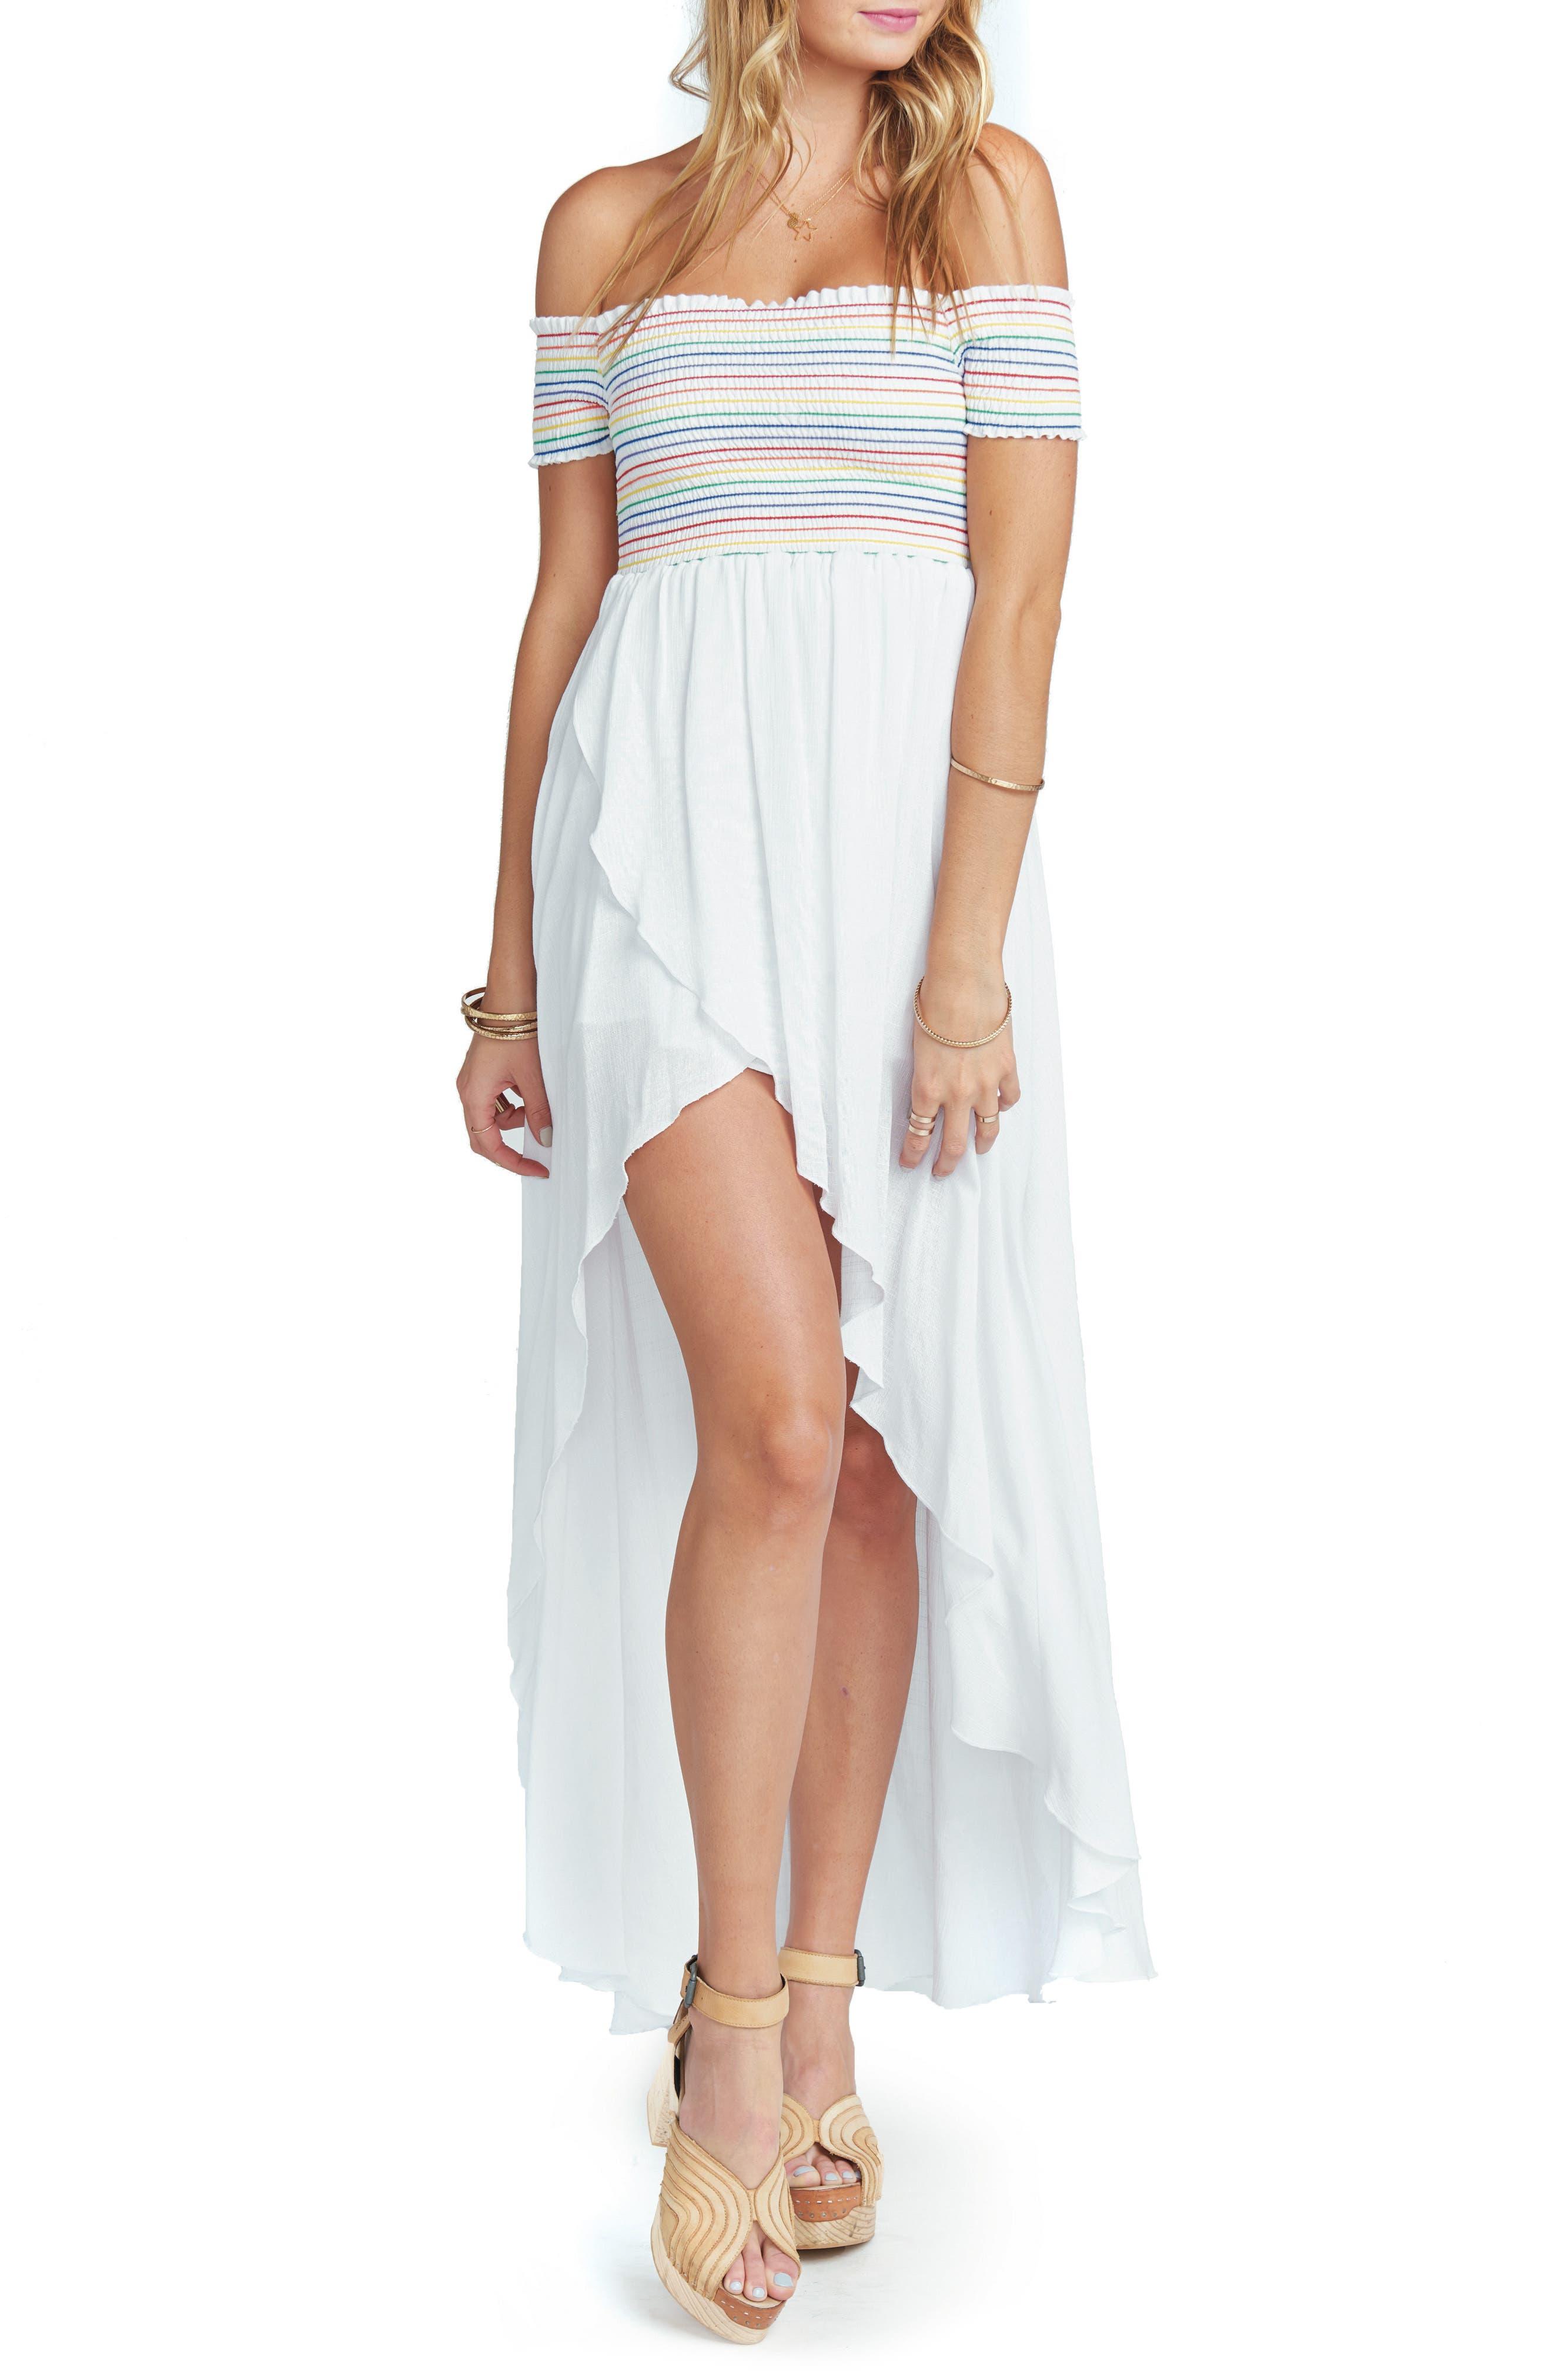 Willa Maxi Dress,                             Main thumbnail 1, color,                             White Cruise With Rainbow